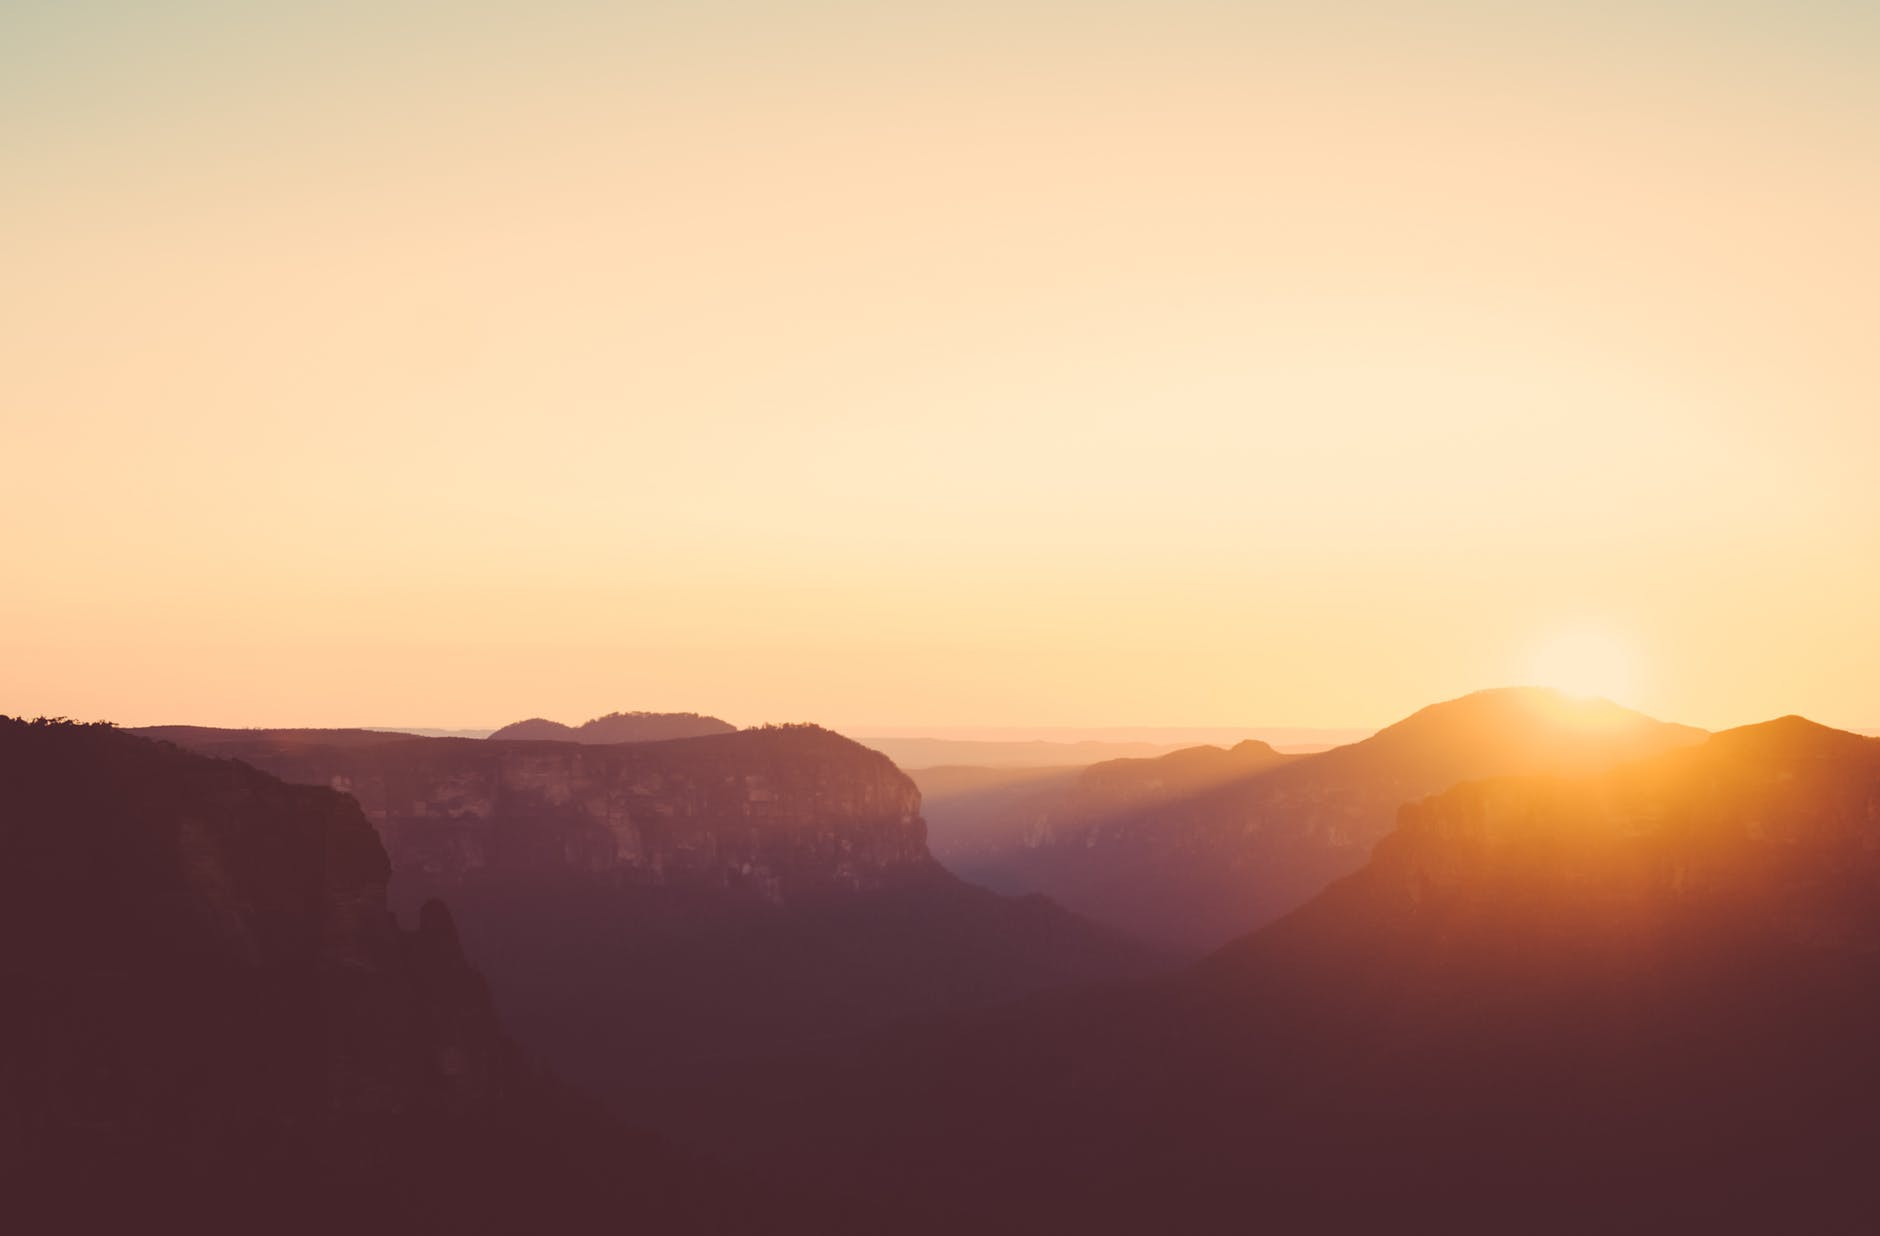 dawn-landscape-mountains-nature.jpg